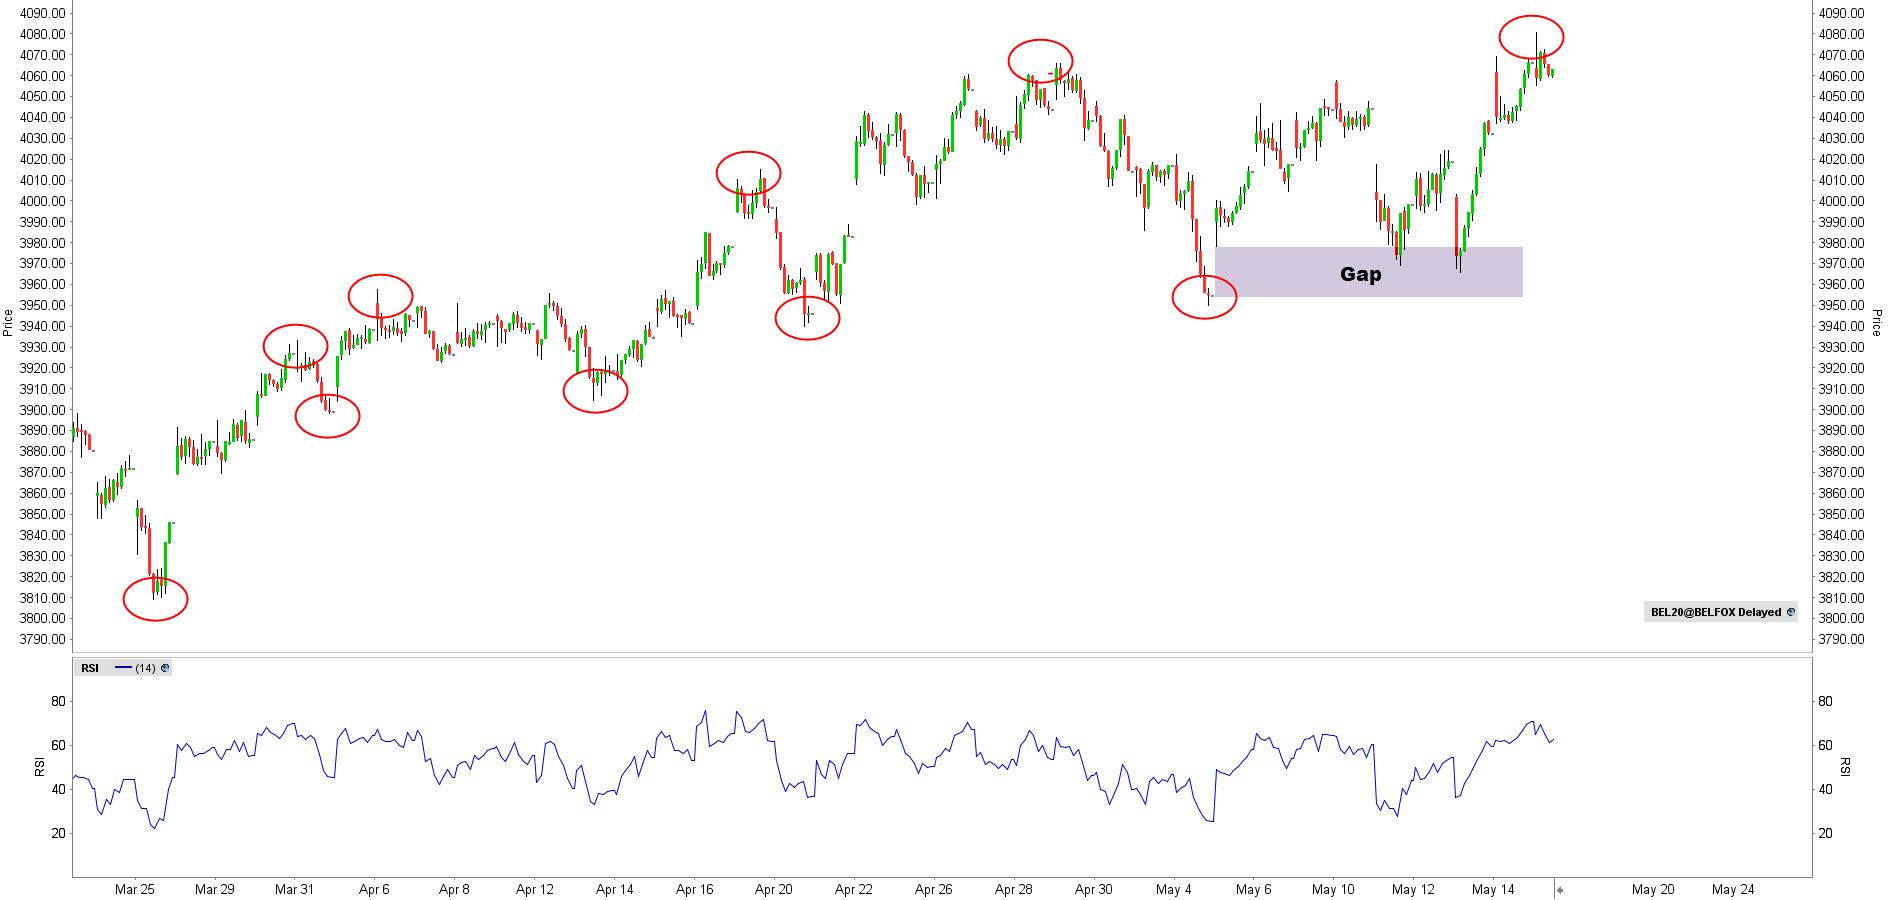 BEL20 gap trade